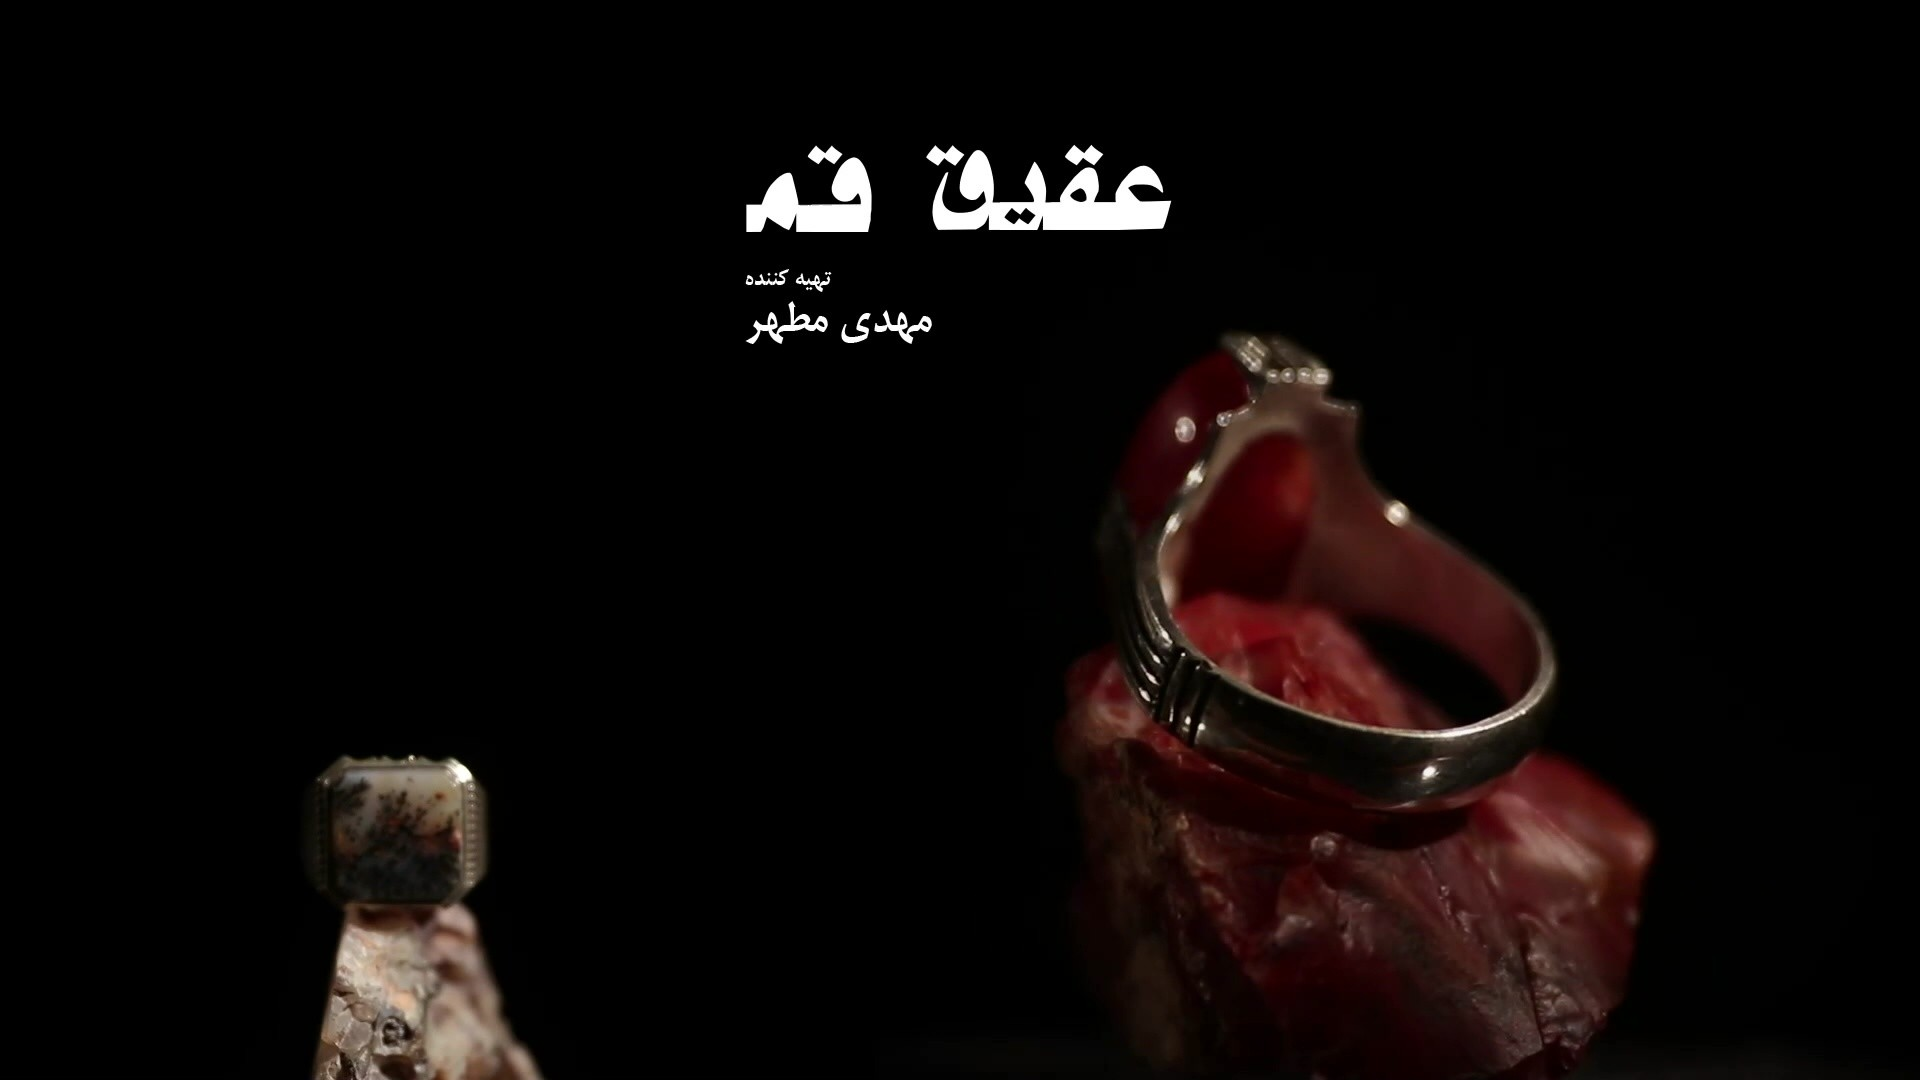 https://www.zahra-media.ir/wp-content/uploads/2021/10/637639415349391076.jpg